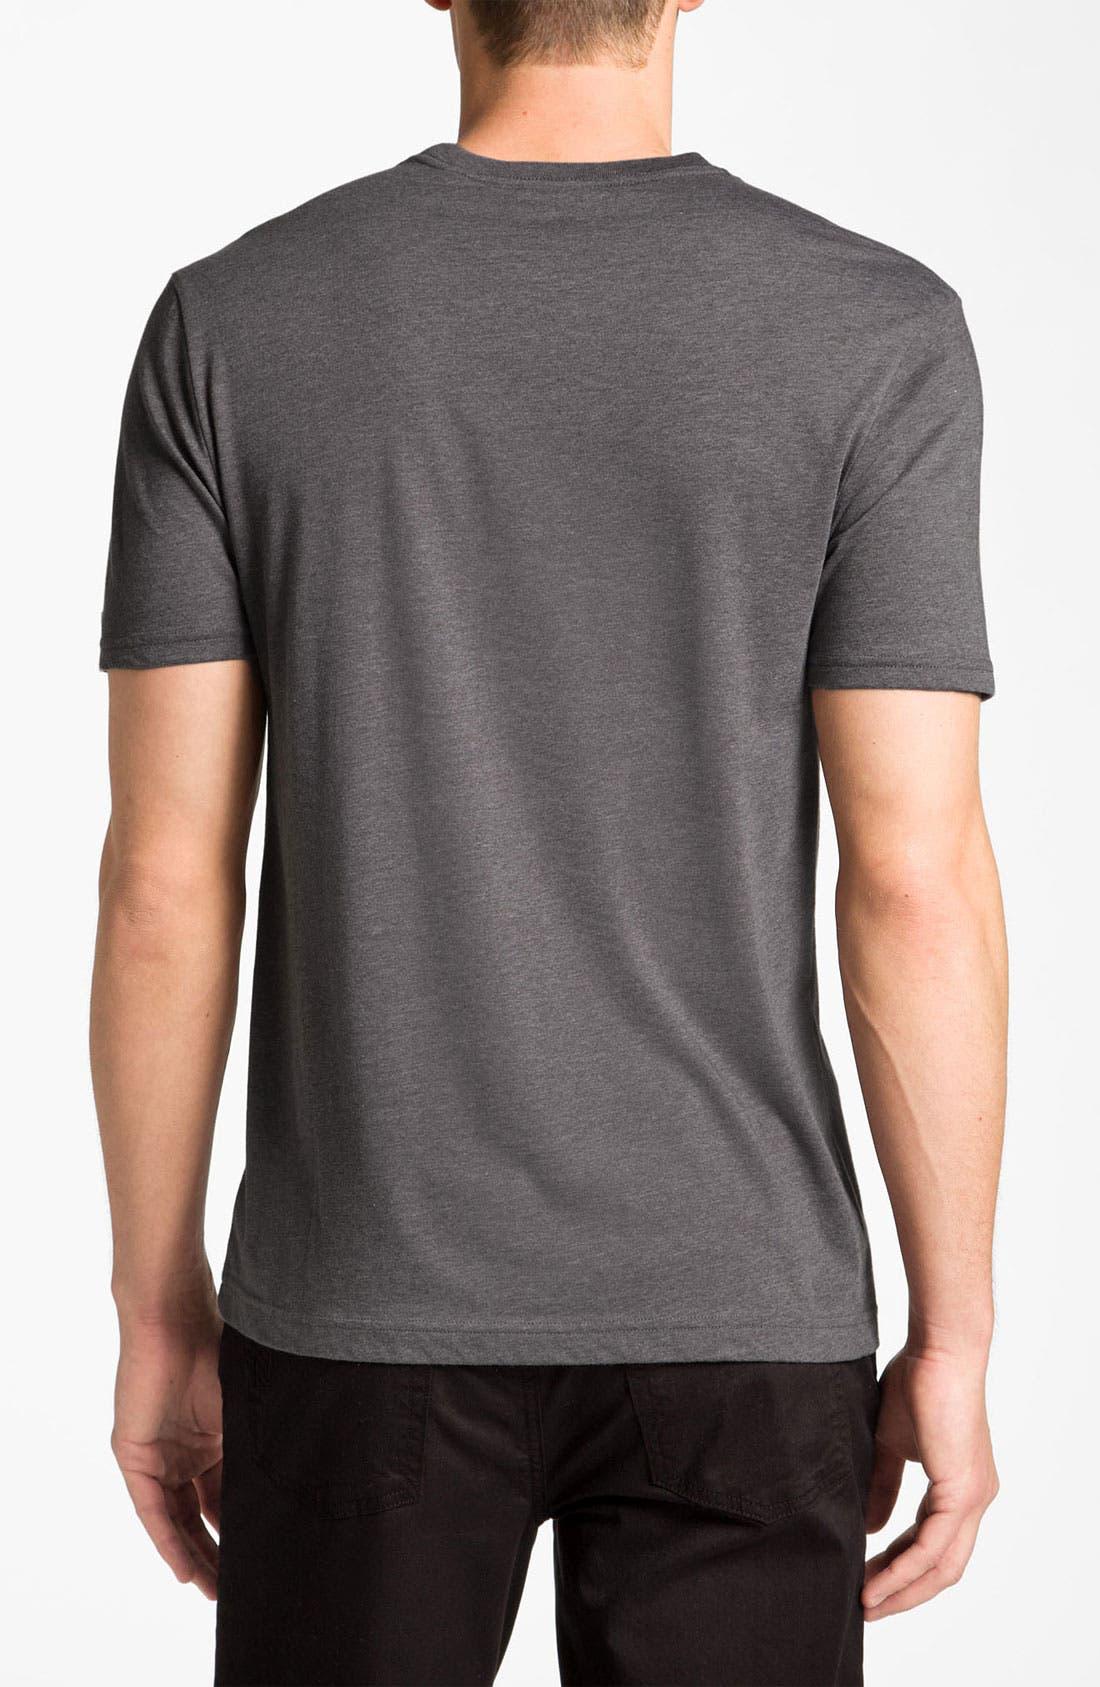 Alternate Image 2  - Original Penguin 'Knock 'Em Out' Graphic Crewneck T-Shirt